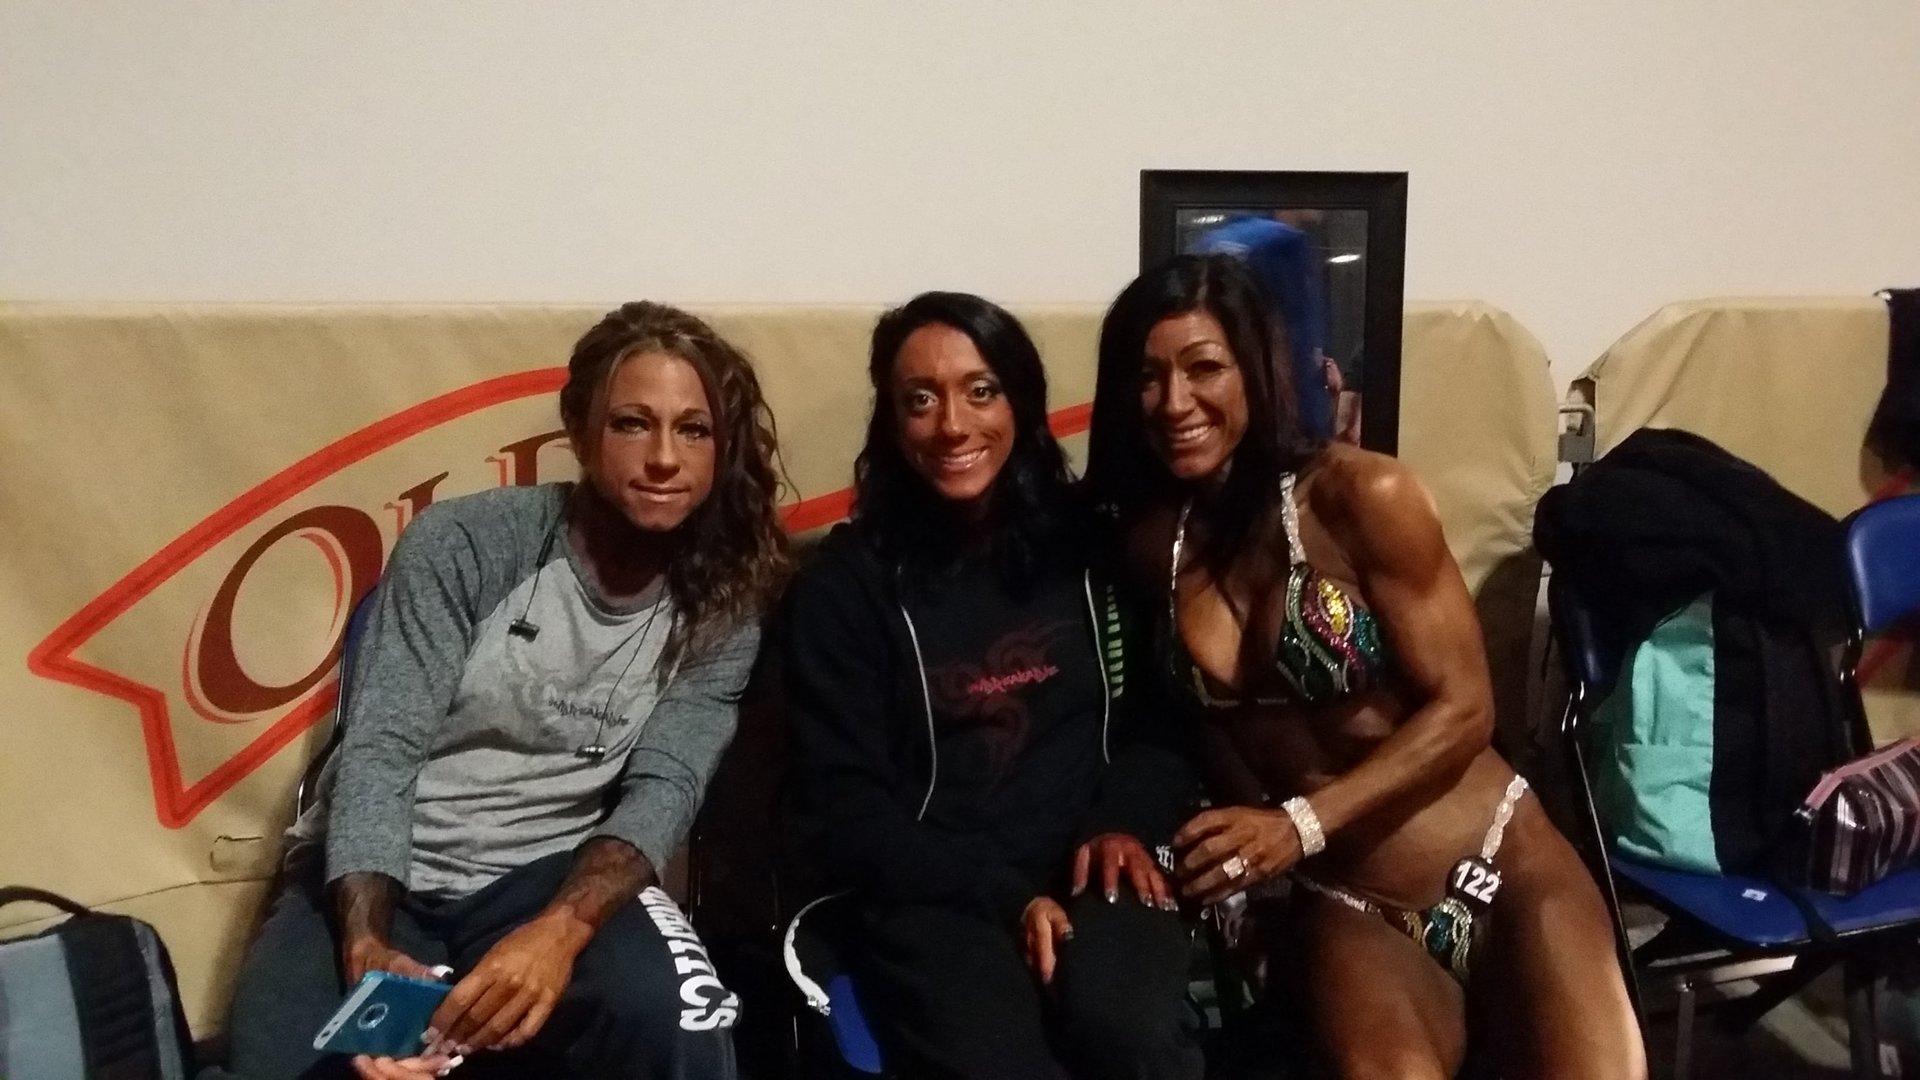 2016 Mr/Ms Buffalo Bodybuilding, Physique, Figure and Bikini Championships